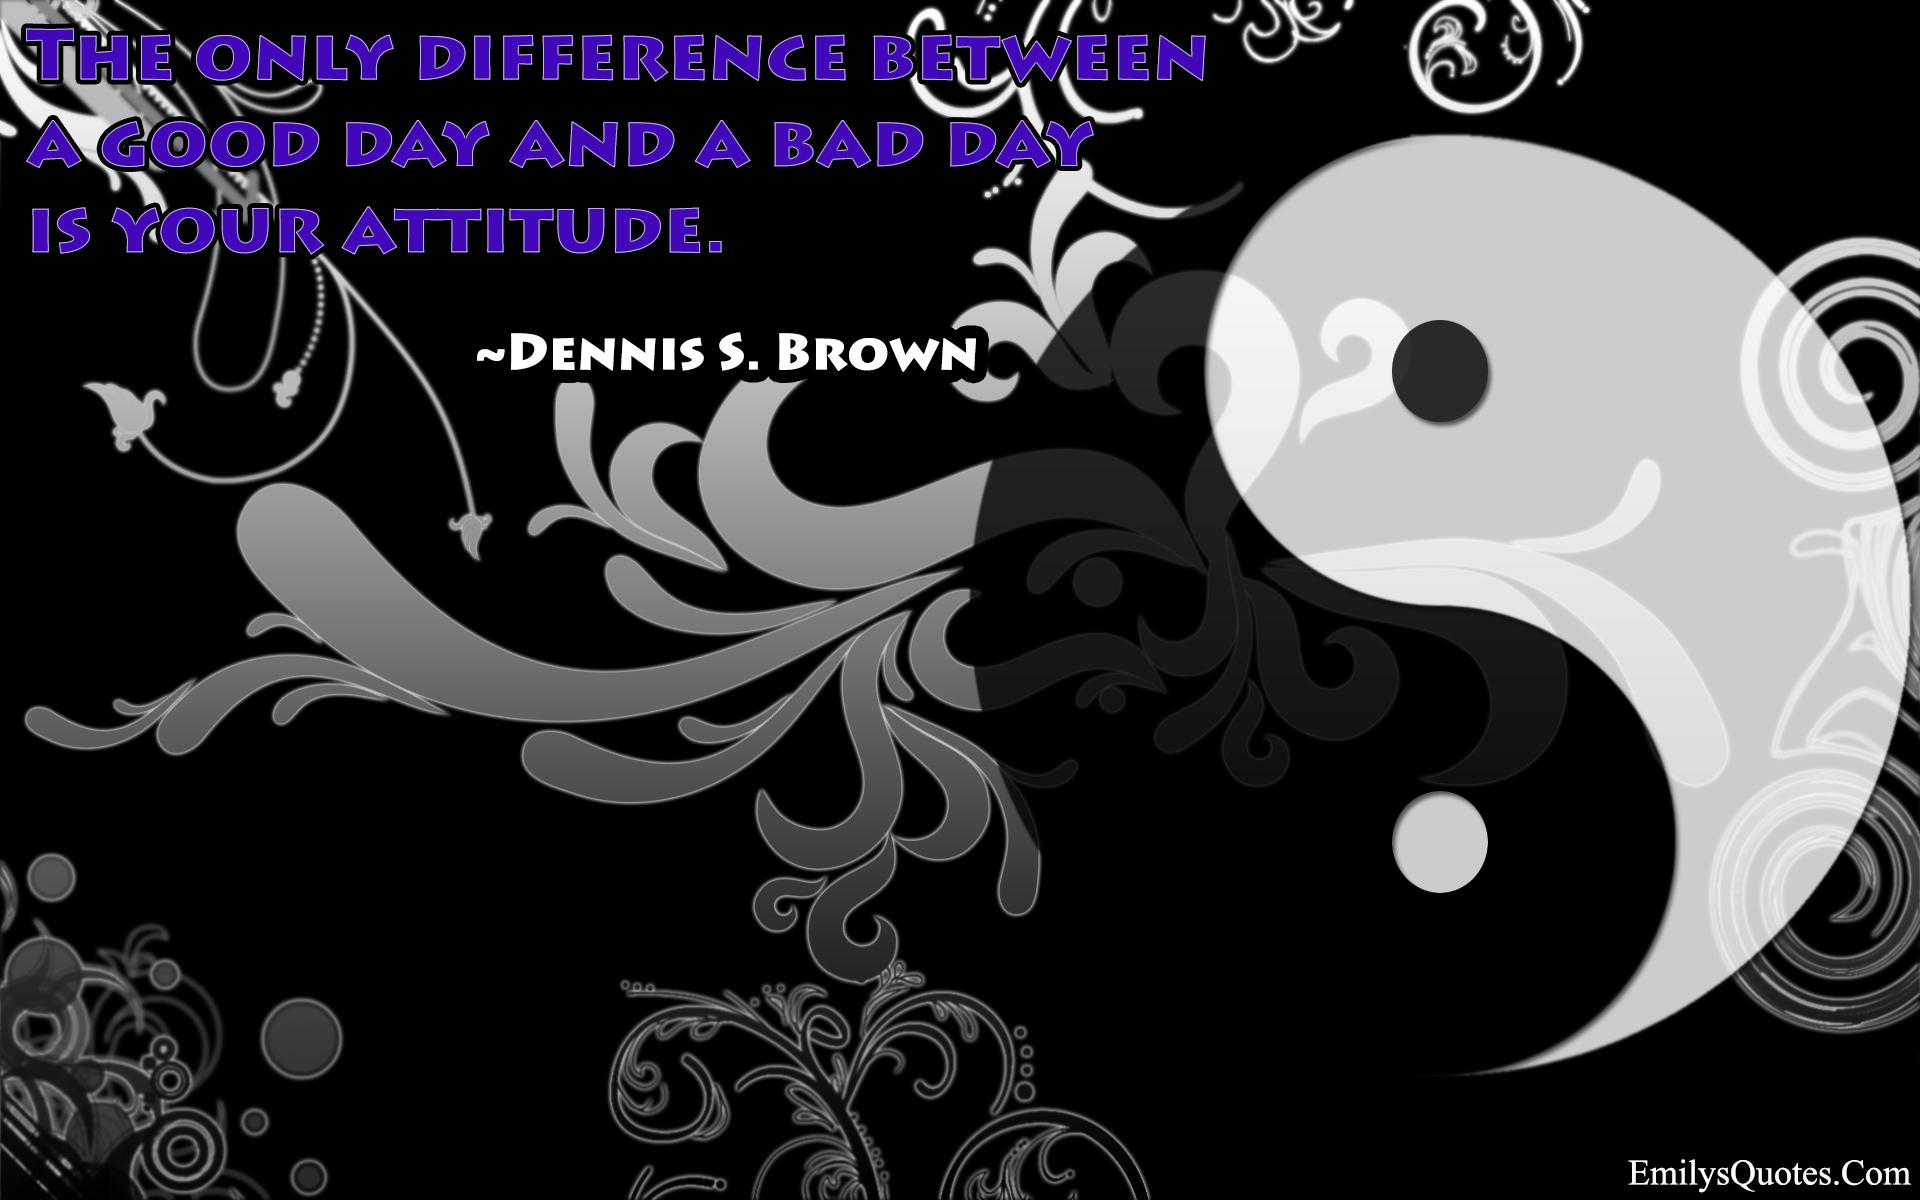 EmilysQuotes.Com - attitude, life, positive, Dennis S. Brown